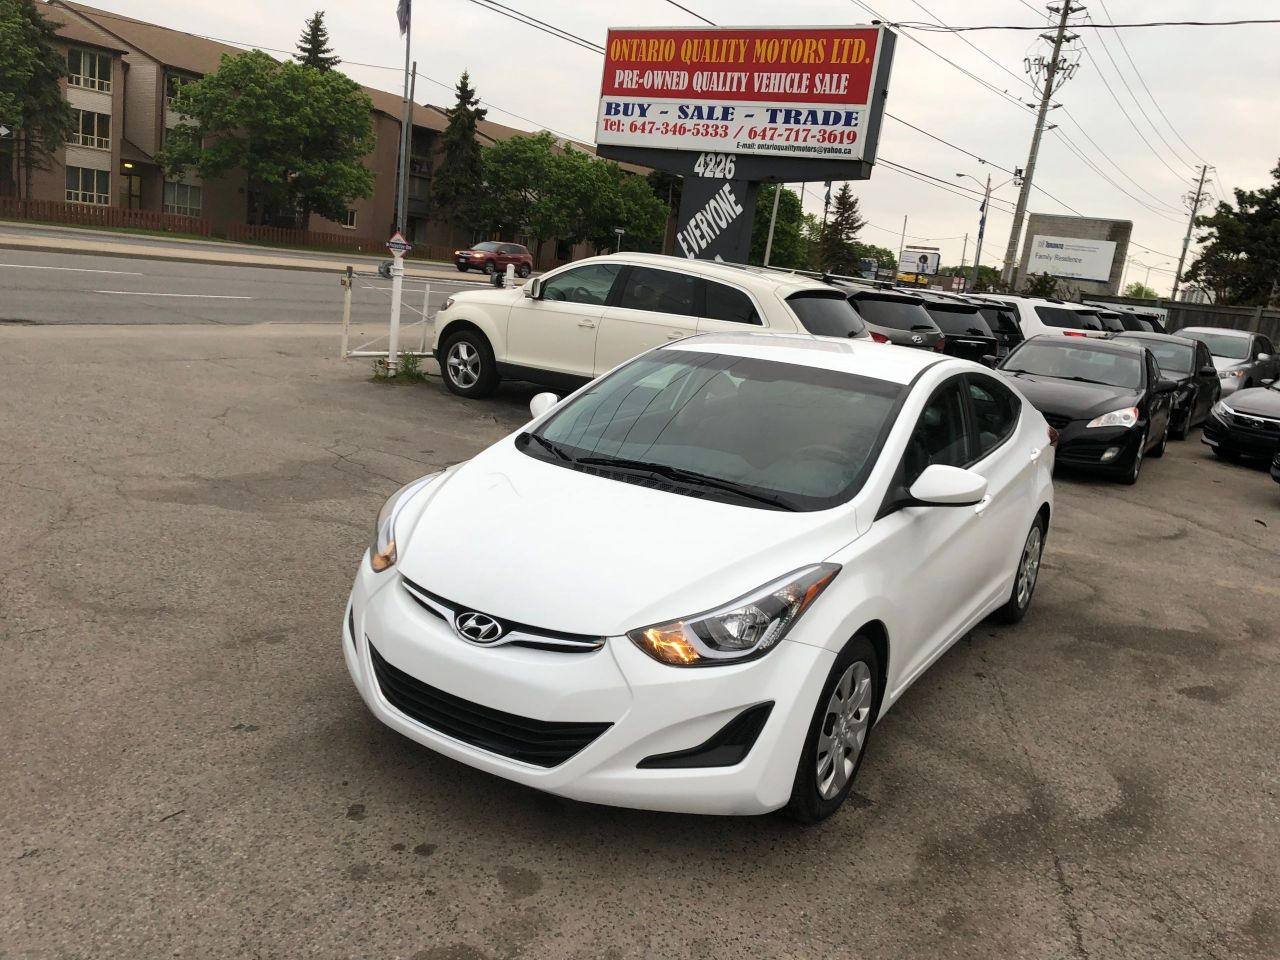 Ontario Quality Motors >> 2016 Hyundai Elantra Ontario Quality Motors Ltd